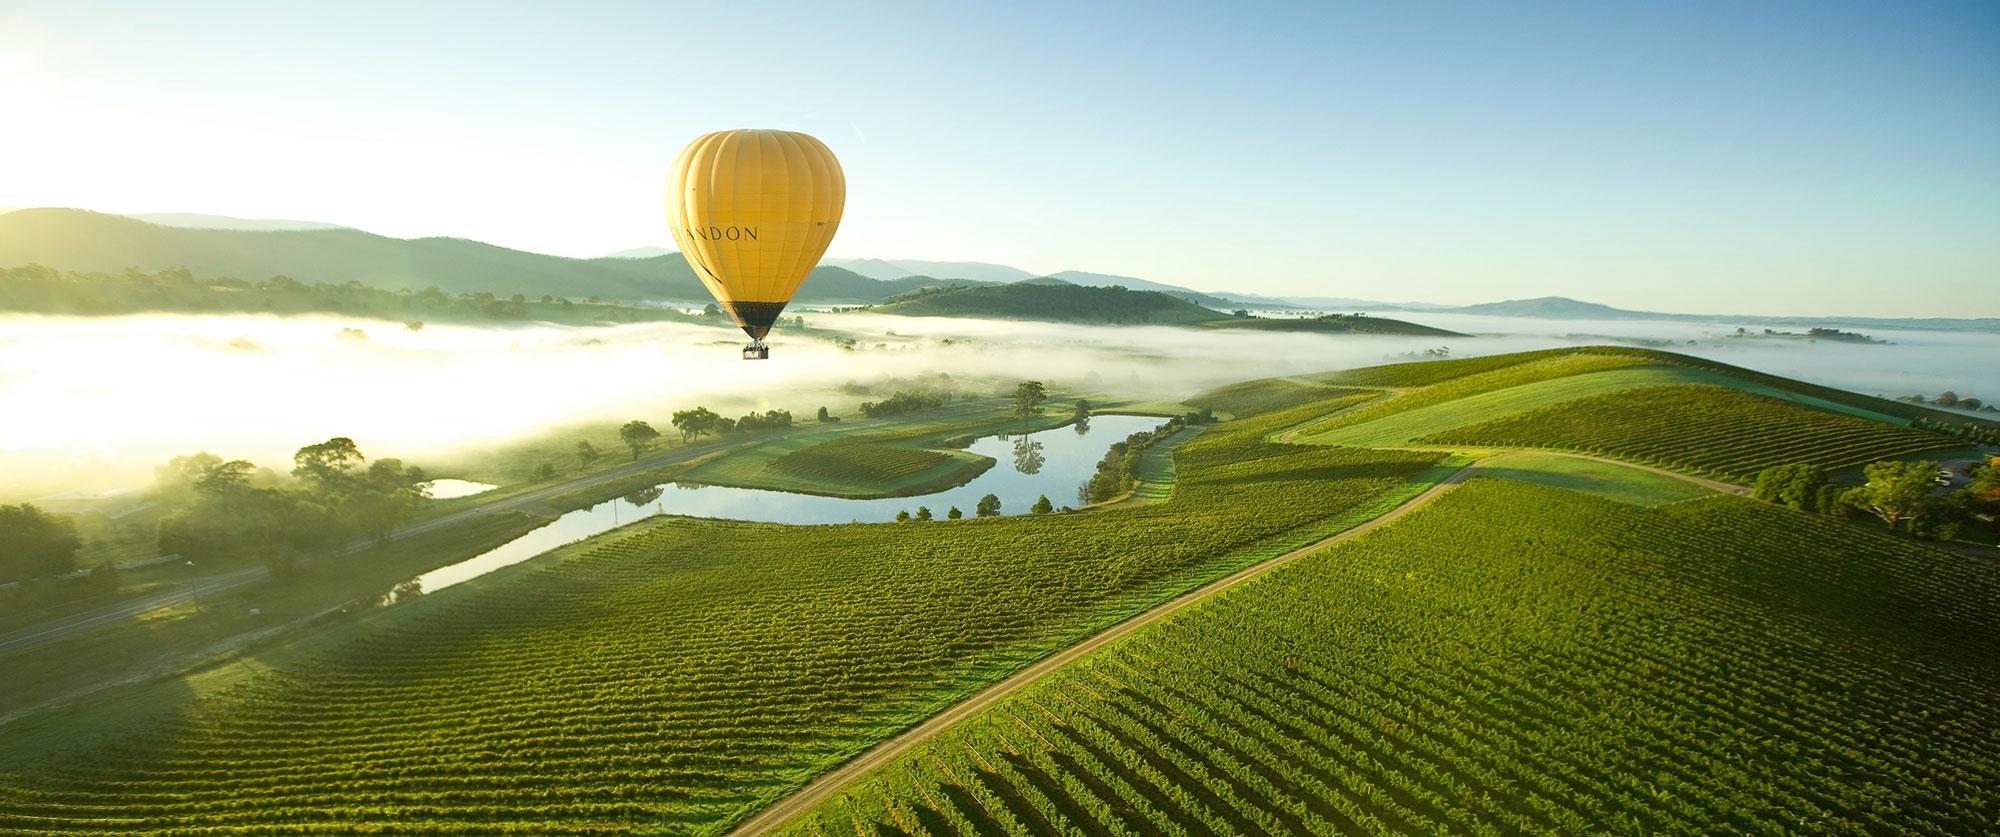 Hot air balloon over Yarra Valley, Victoria, Australia